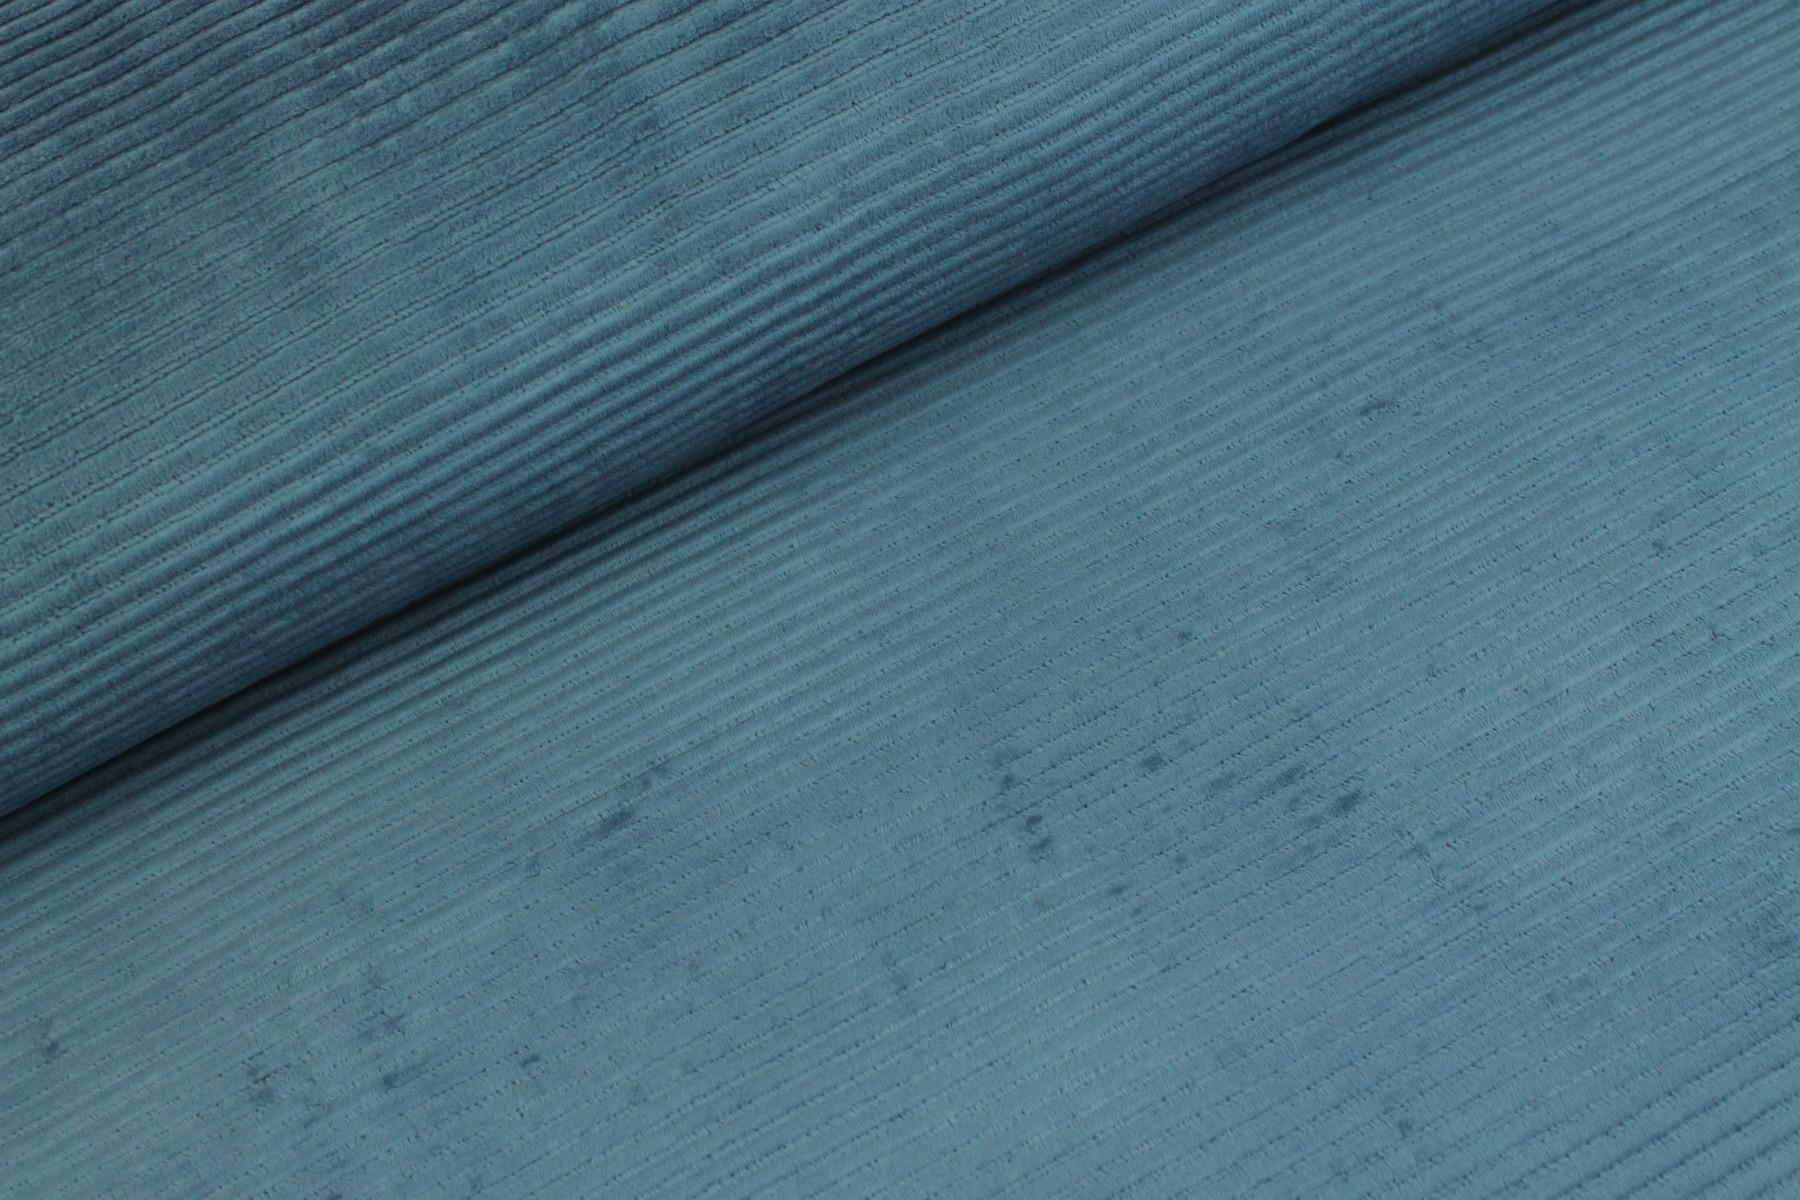 Cotton Knit Big Cord - Dark Jeans